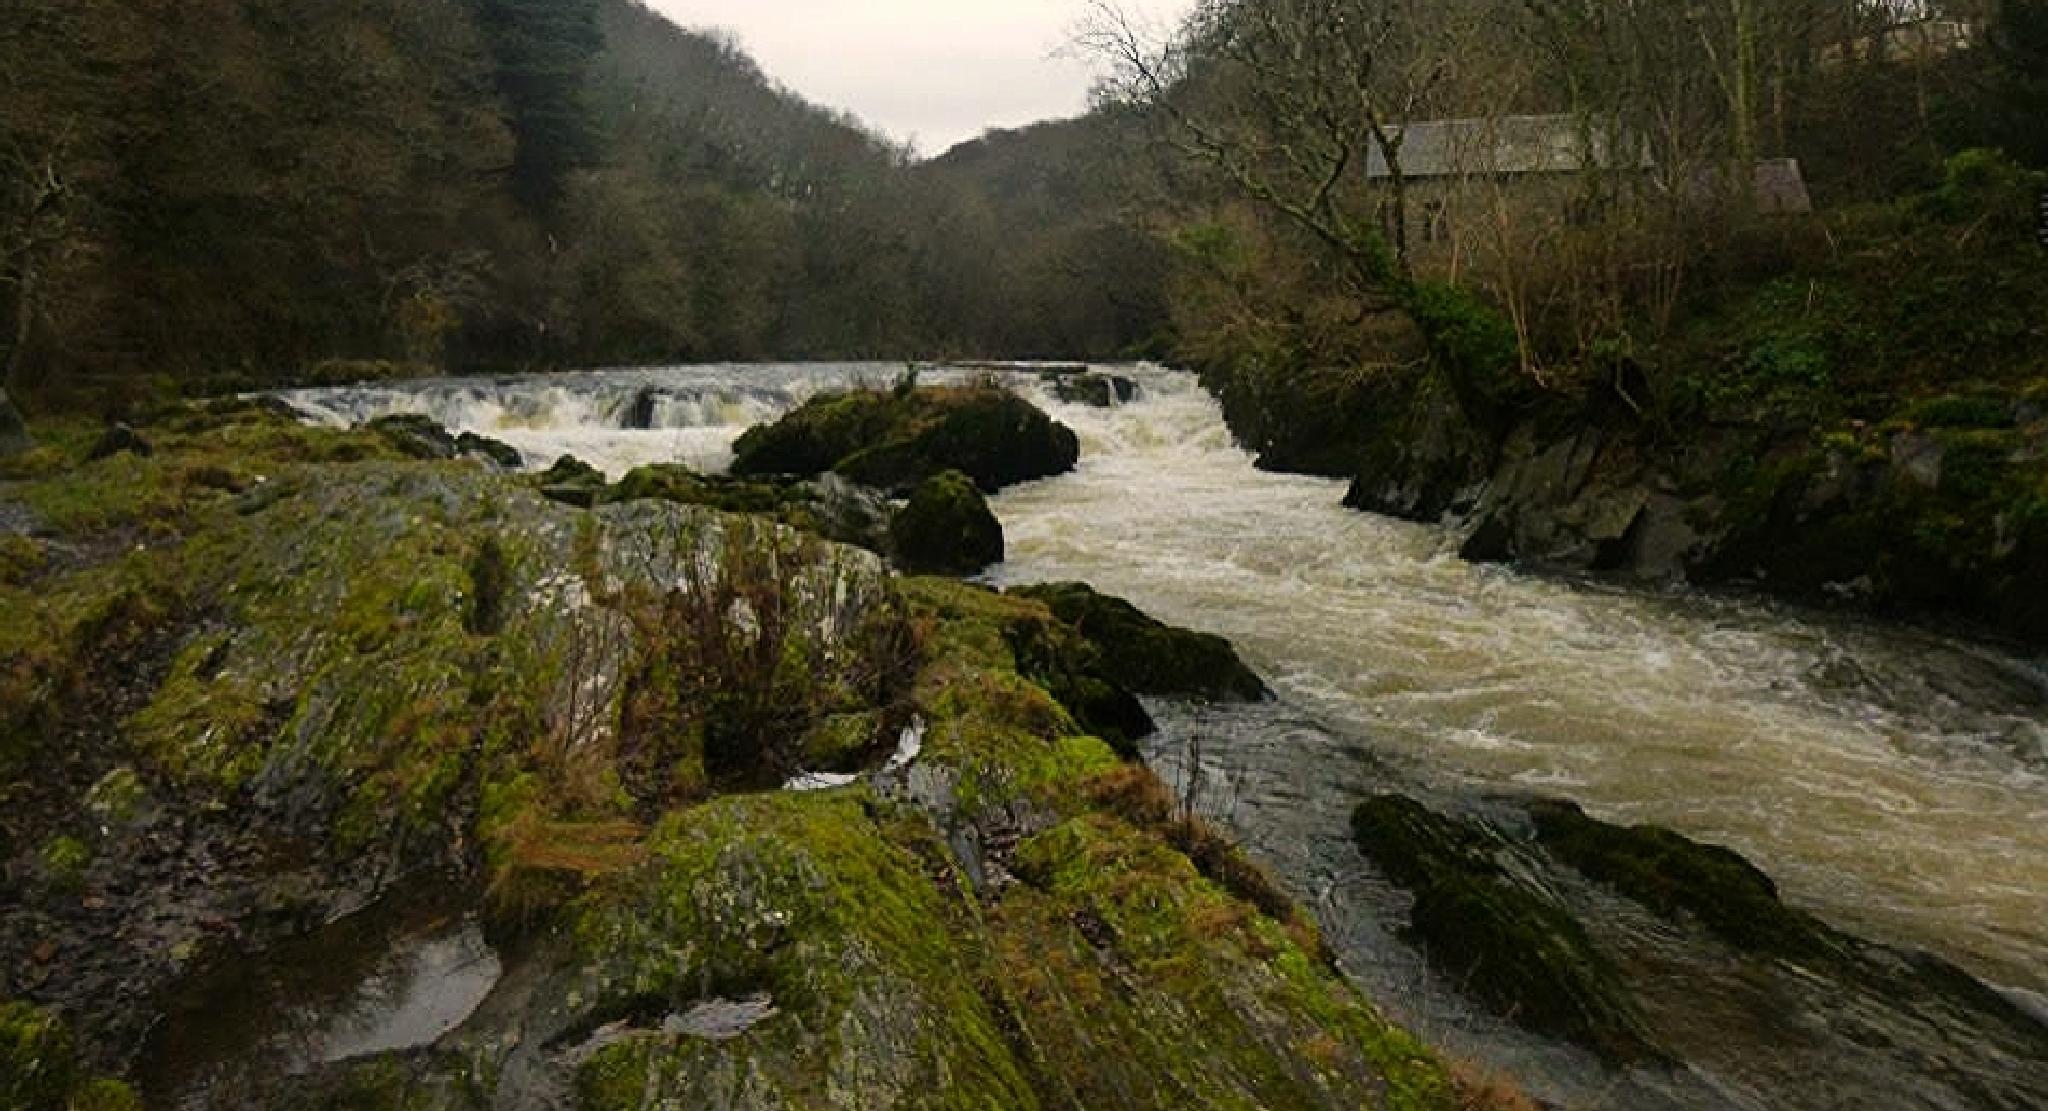 river teifi by chris.adams.3557